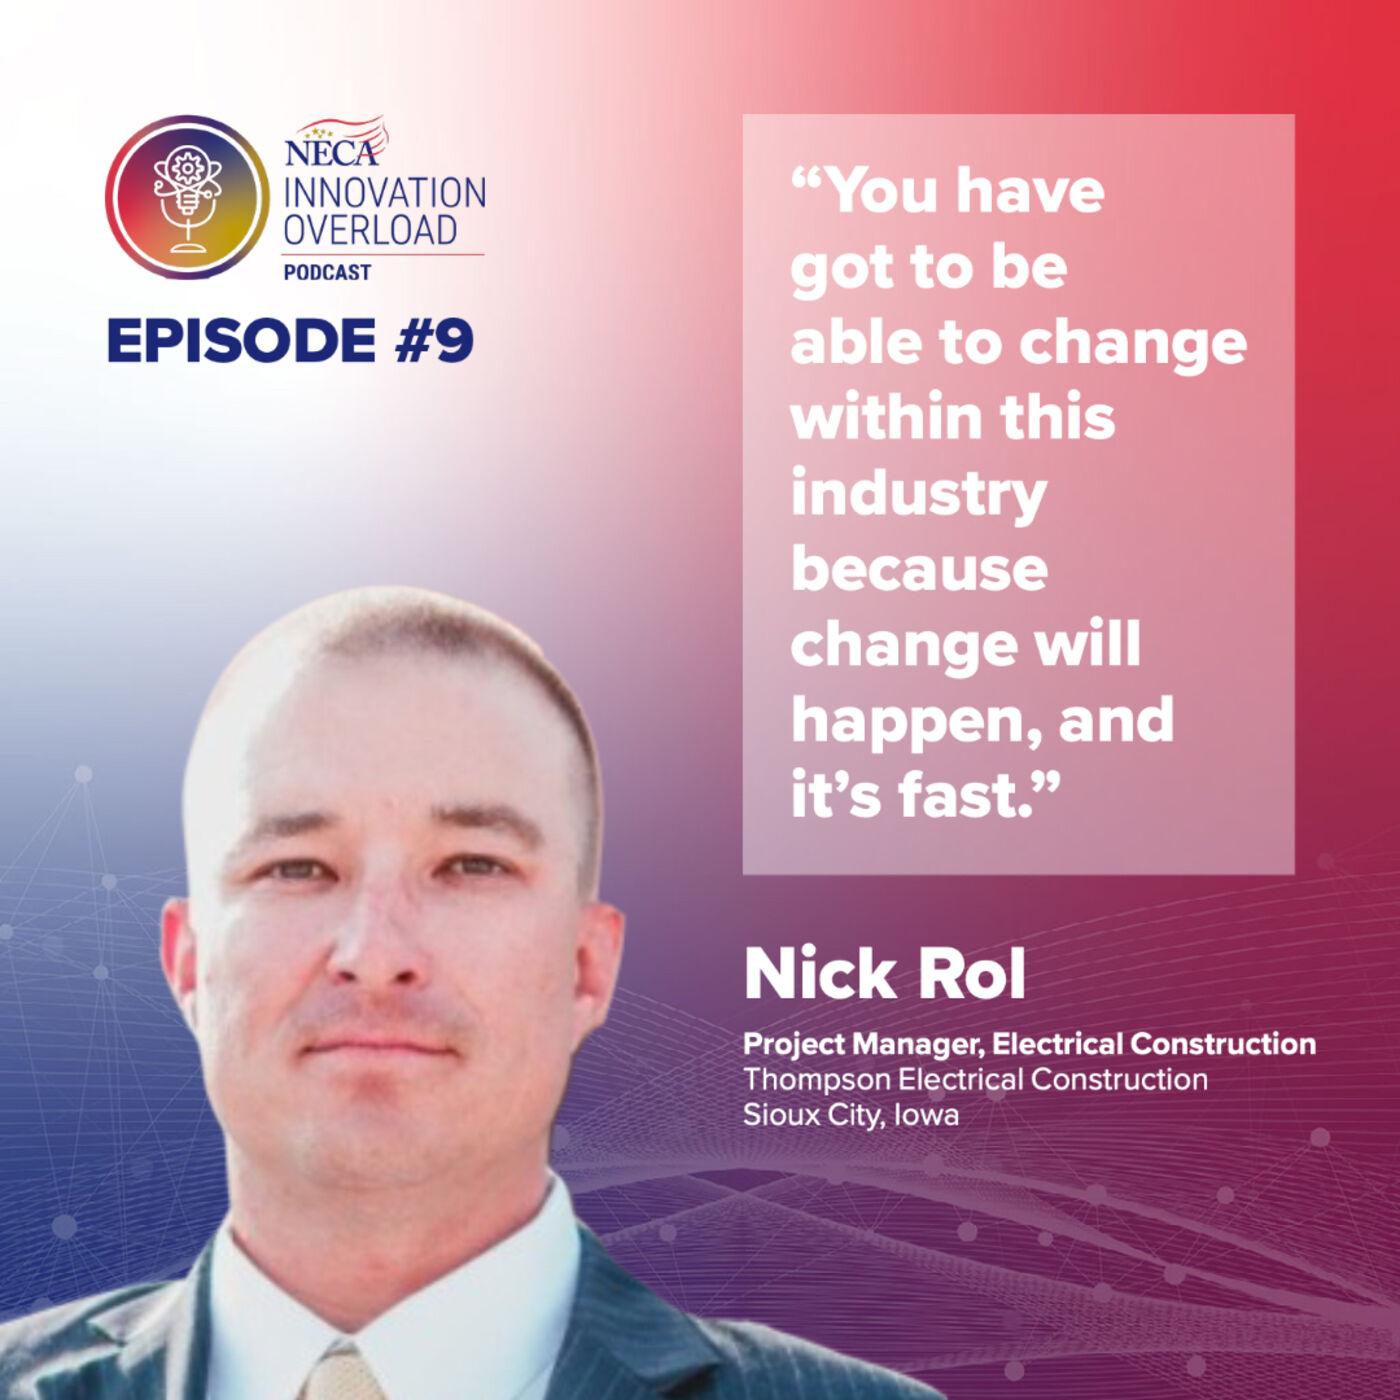 #9 Nick Rol